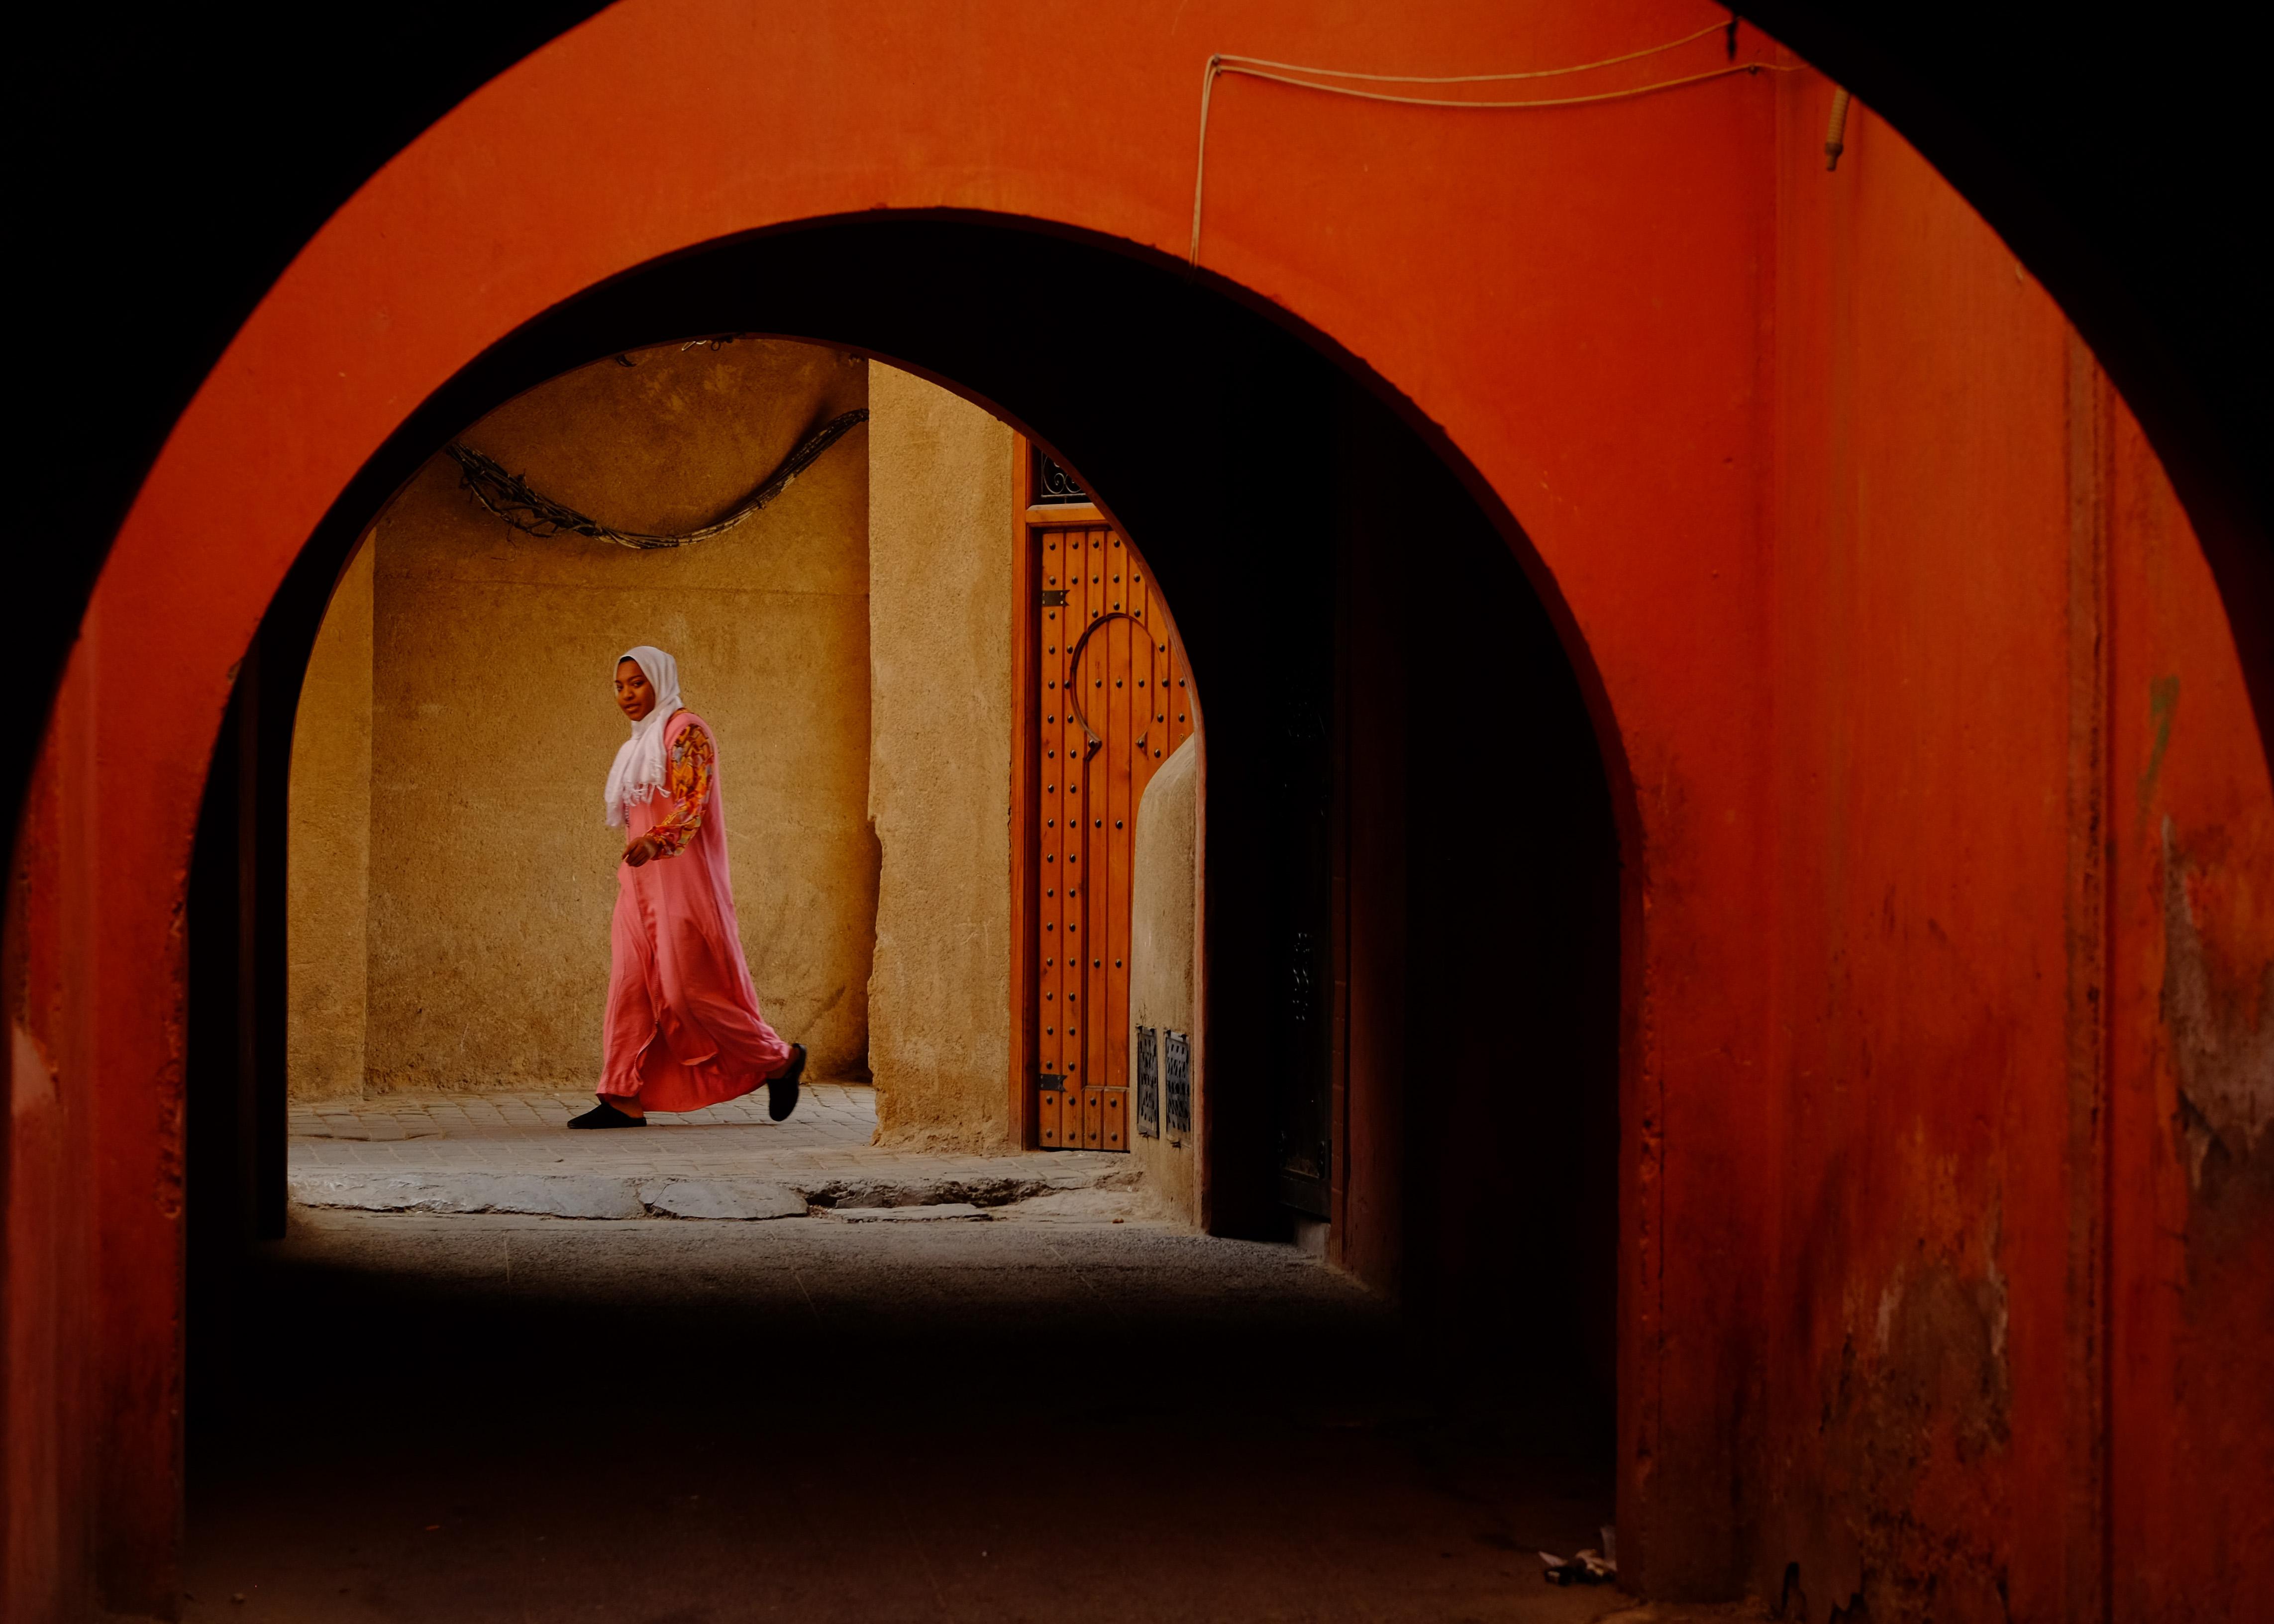 Maroc (11 of 20)